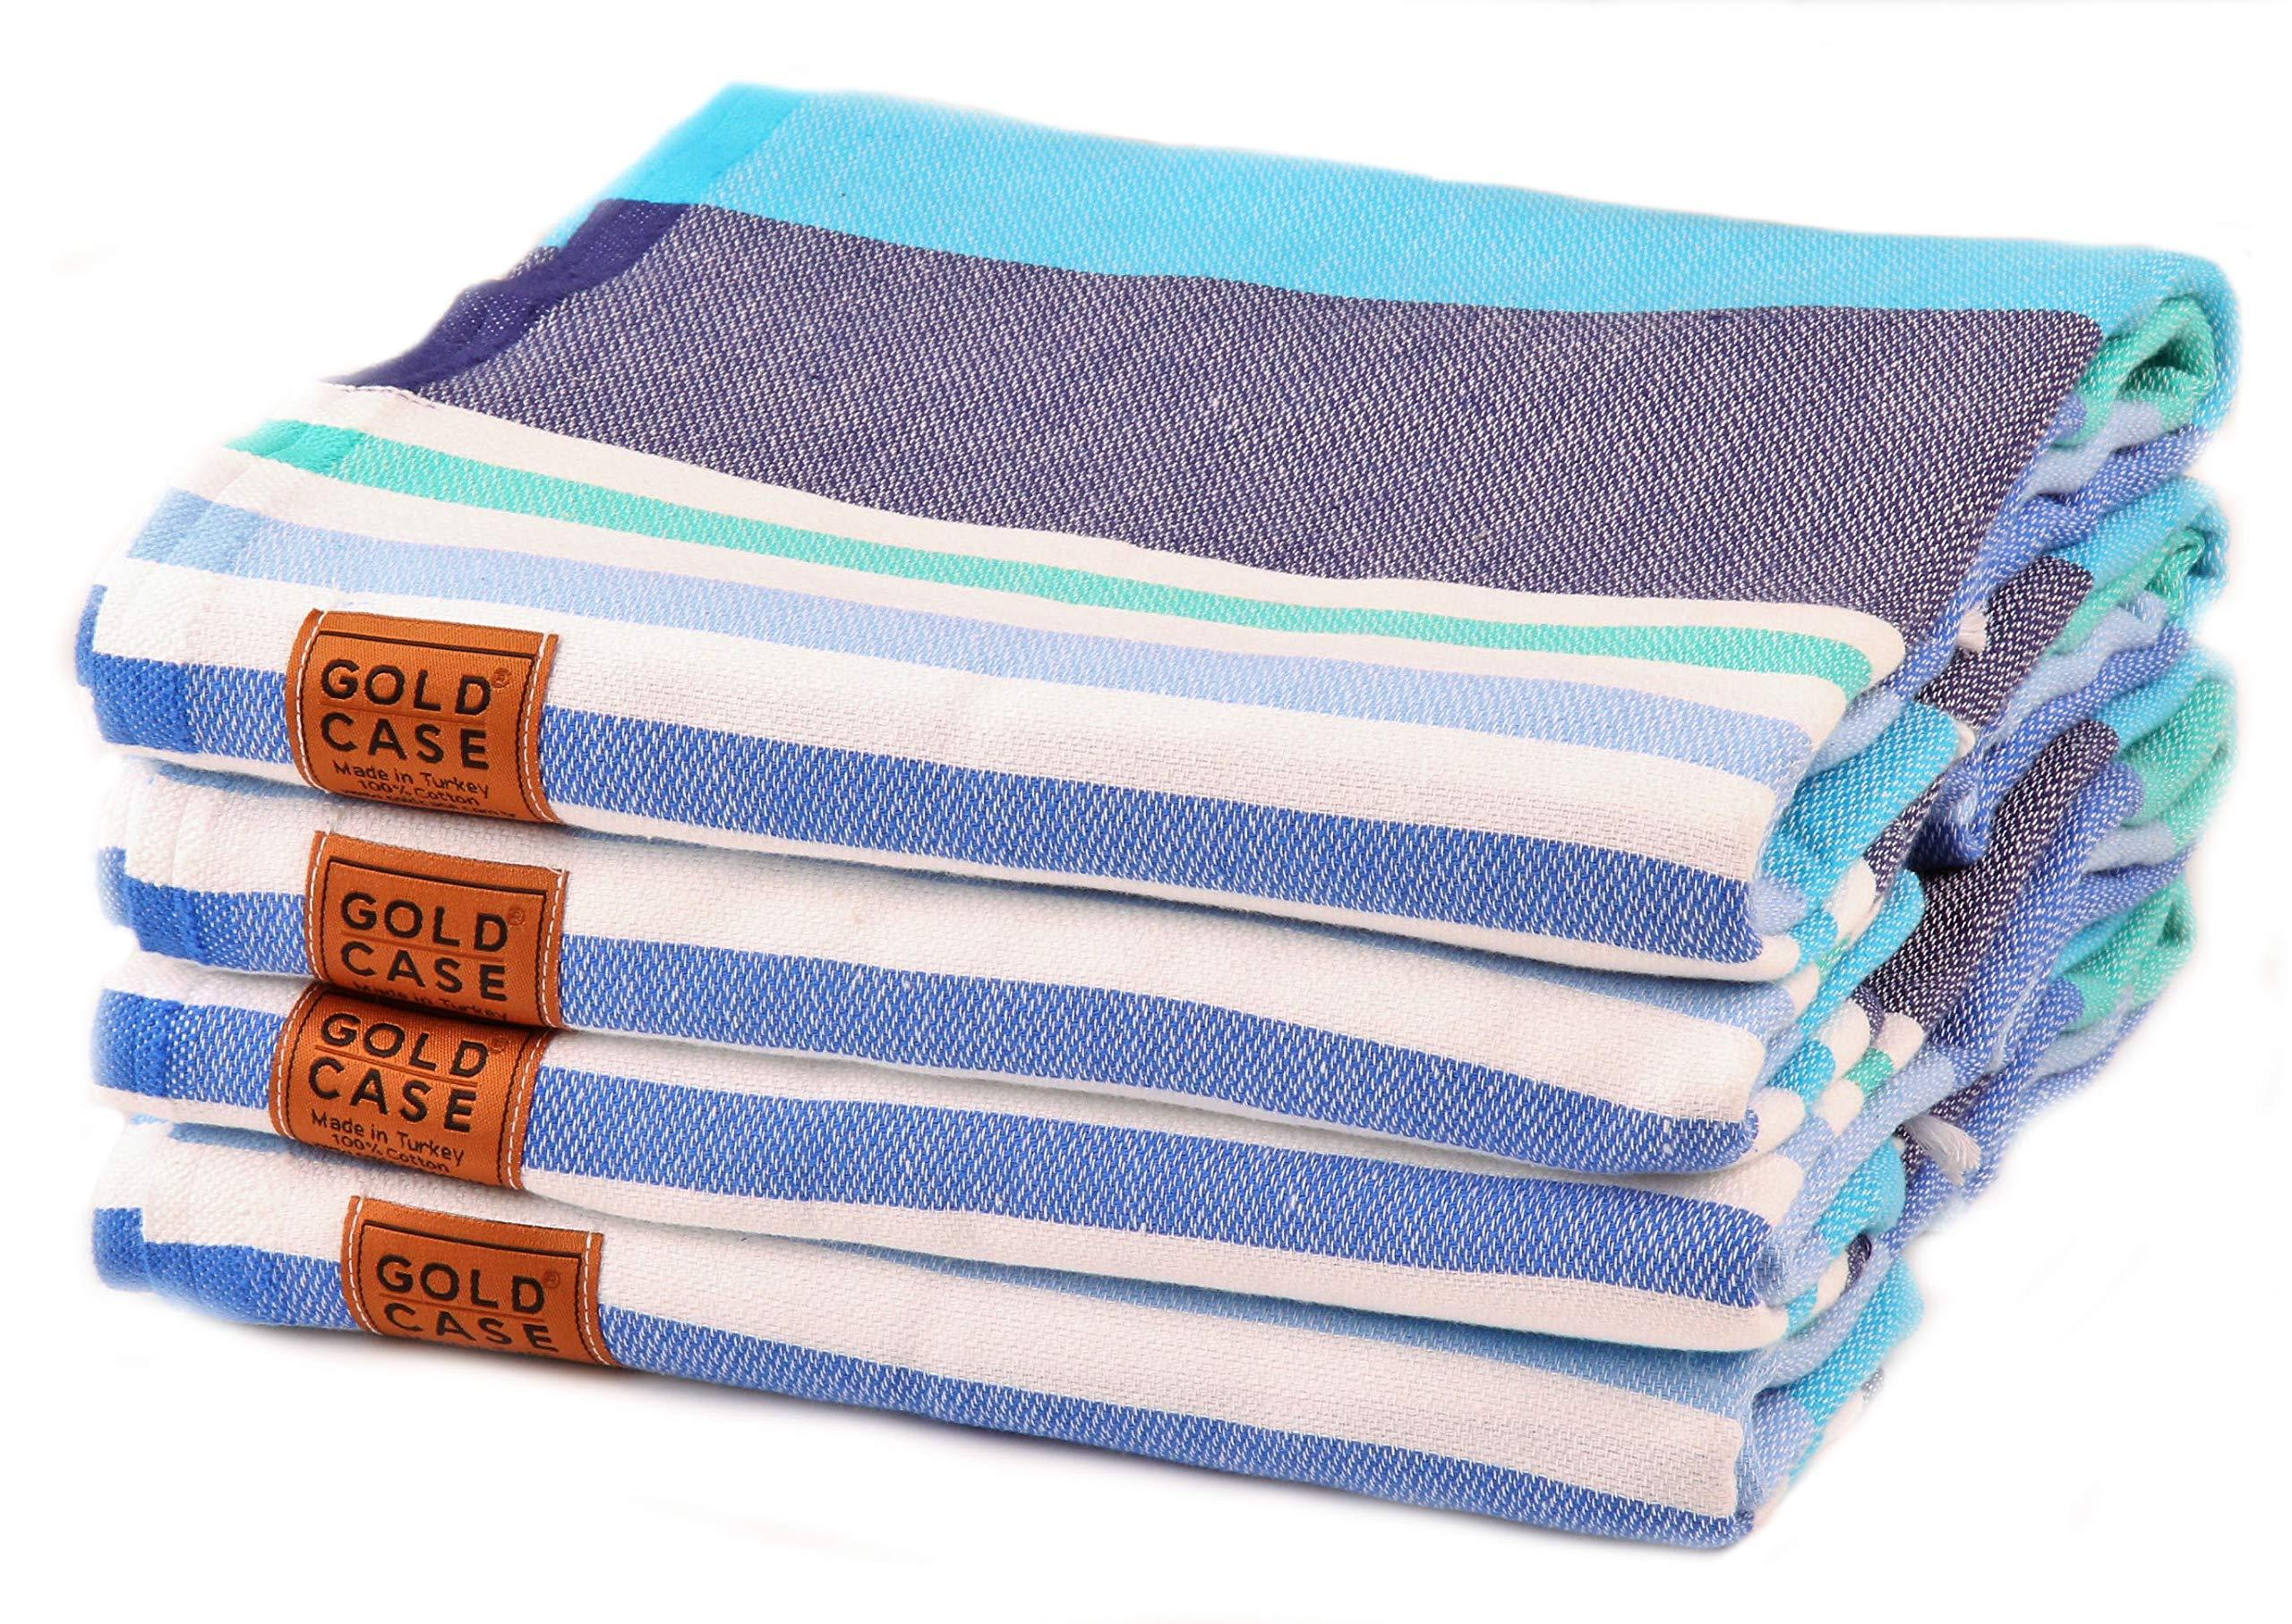 Gold Case Set of 4 XXL and Thick OLYMPOS Turkish Cotton Bath Beach Hammam Towels Peshtemal Towel Throw Blanket (Blue)